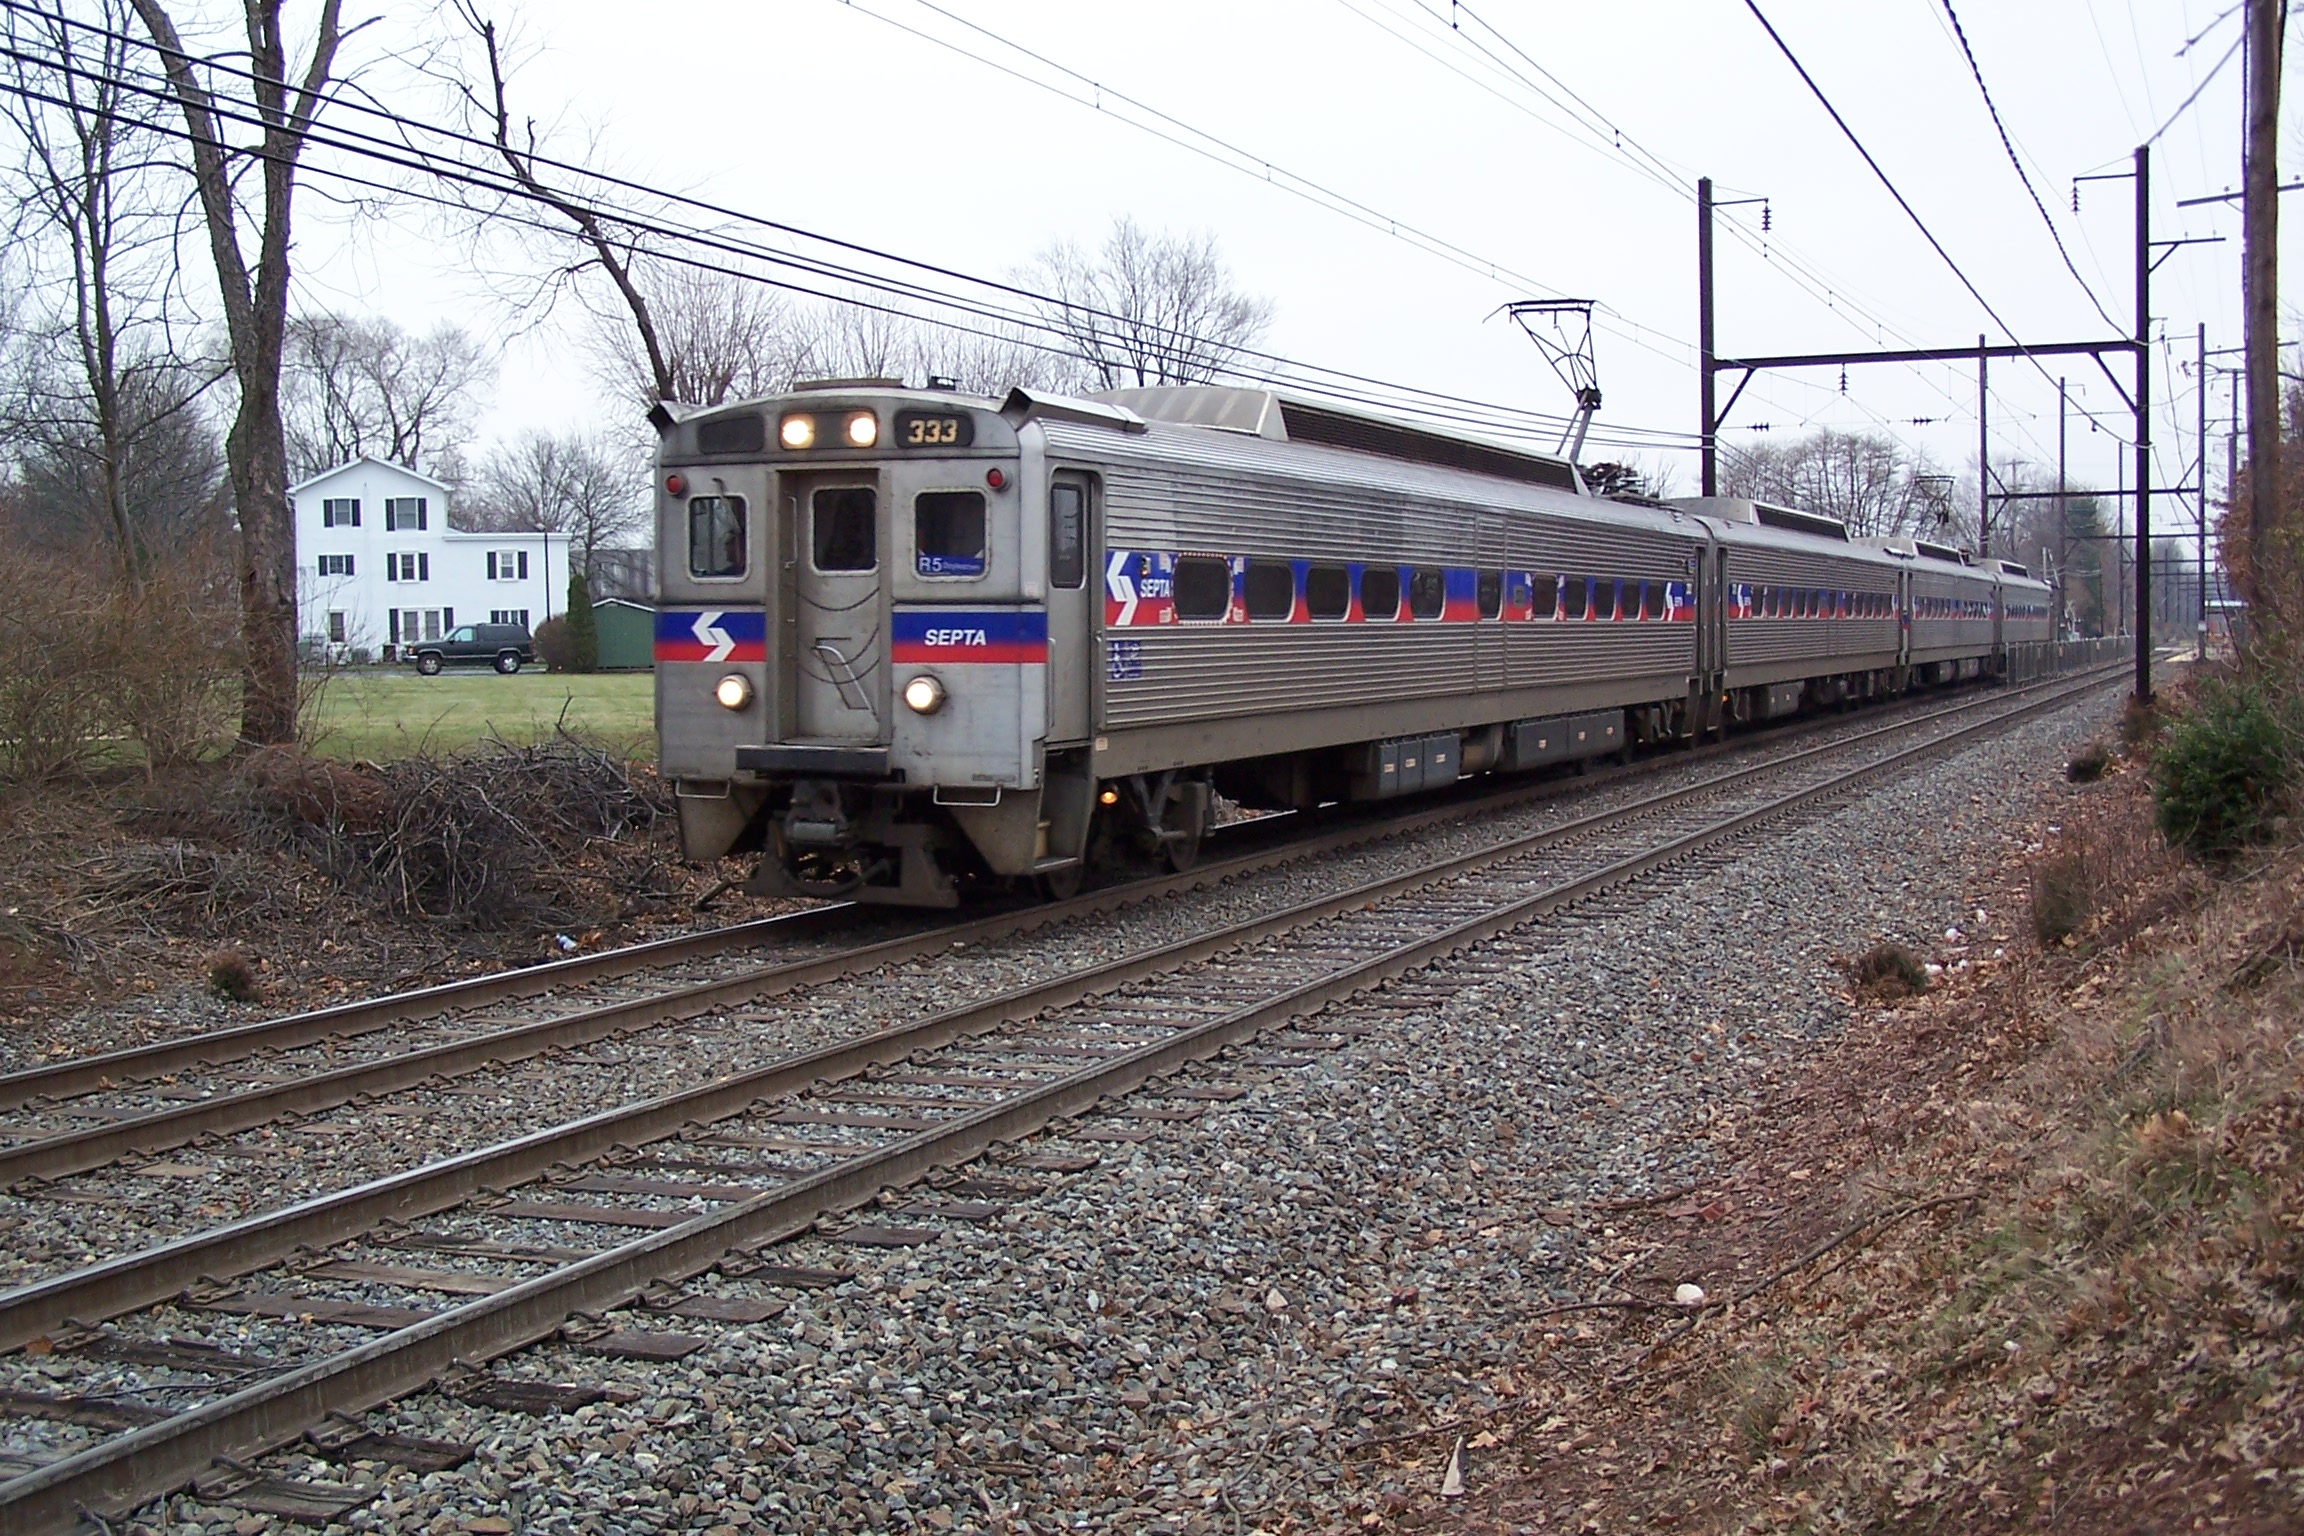 Septa trains from philadelphia to new york city